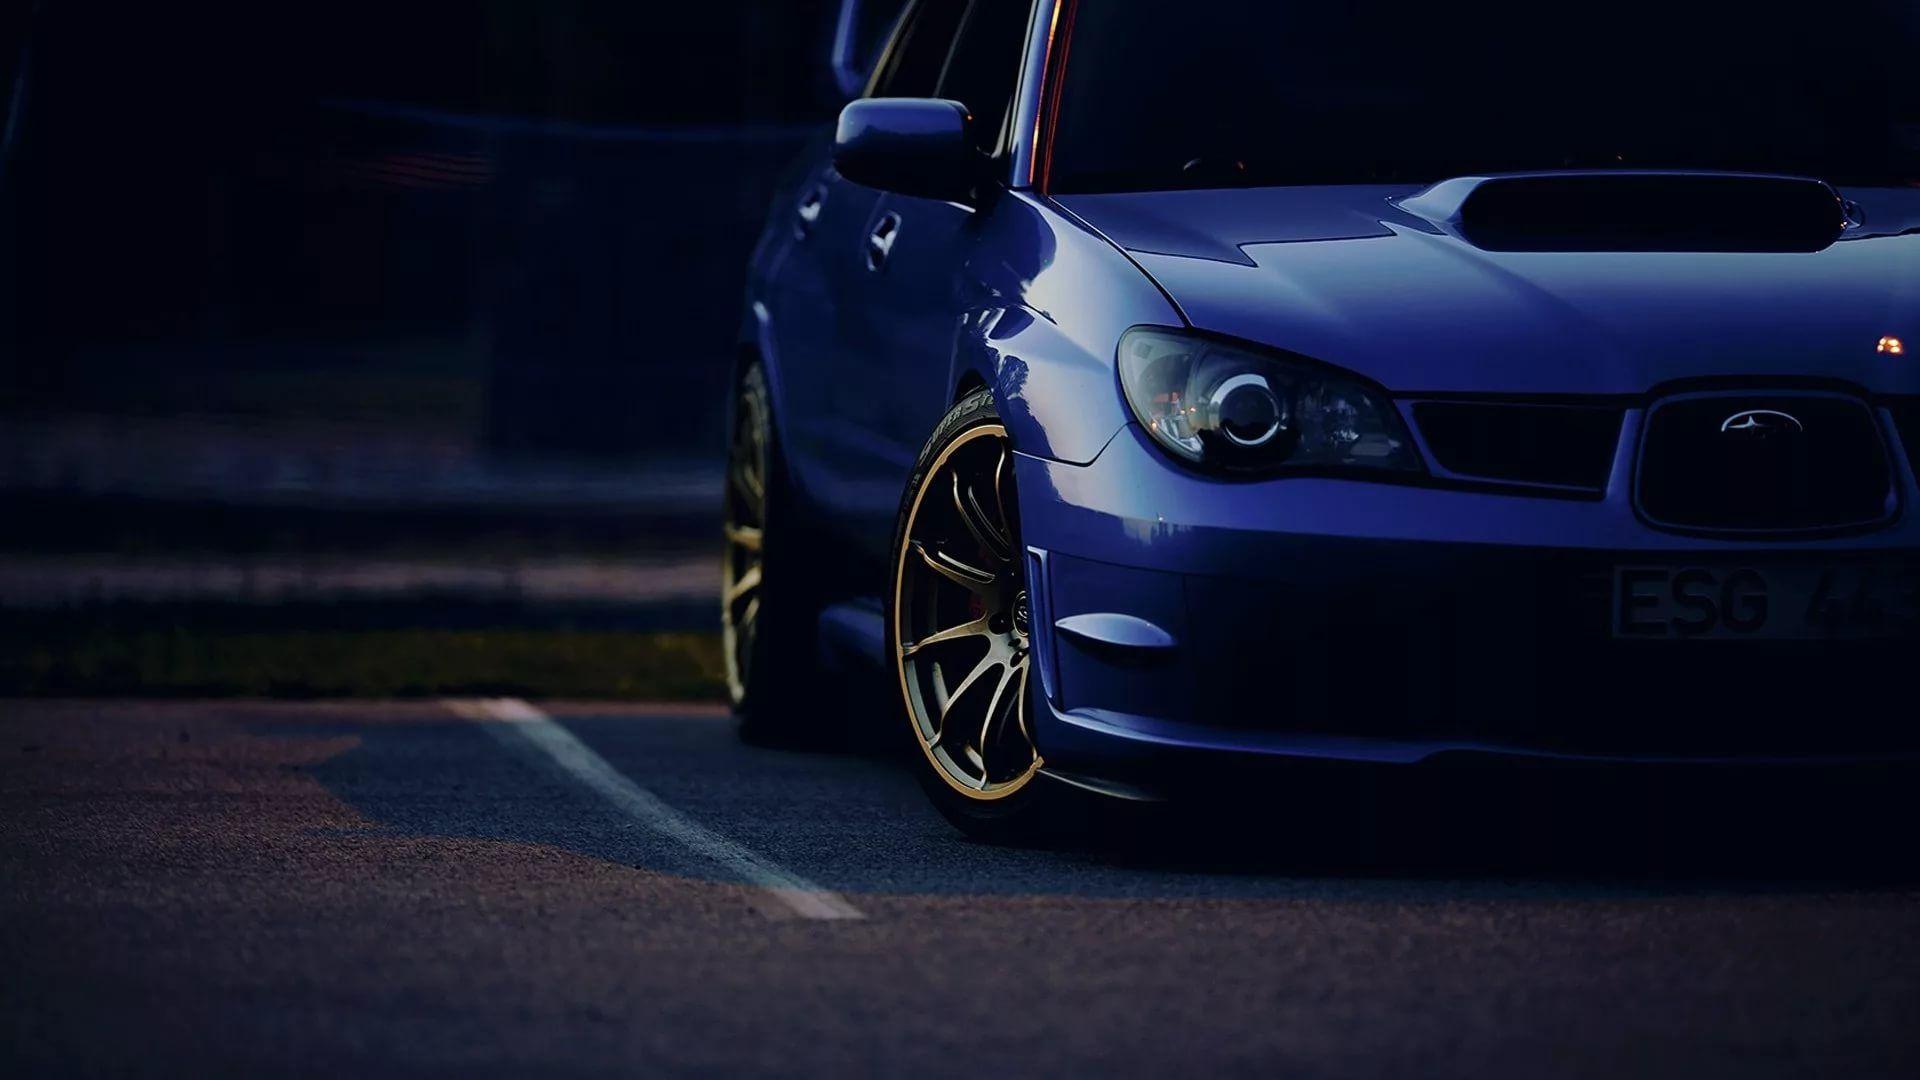 Subaru WRX wallpaper image